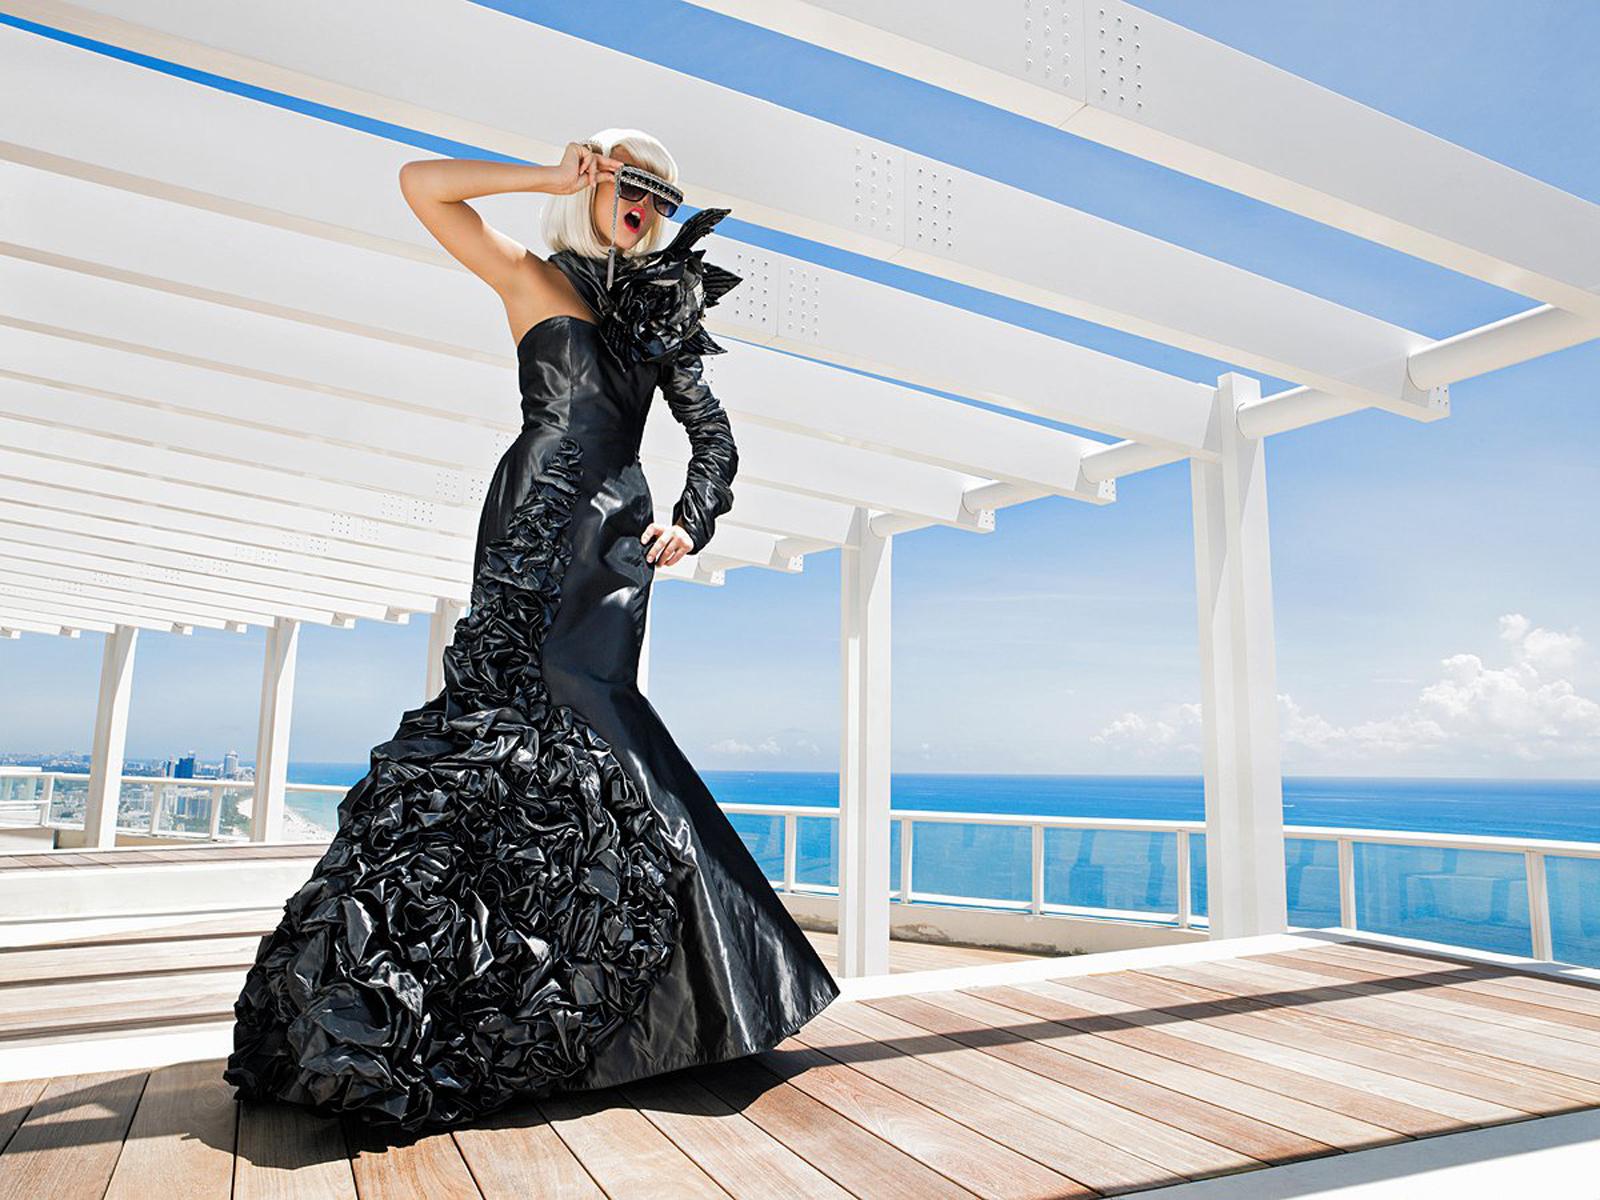 carlos-j-toppro-gallery-2012-05